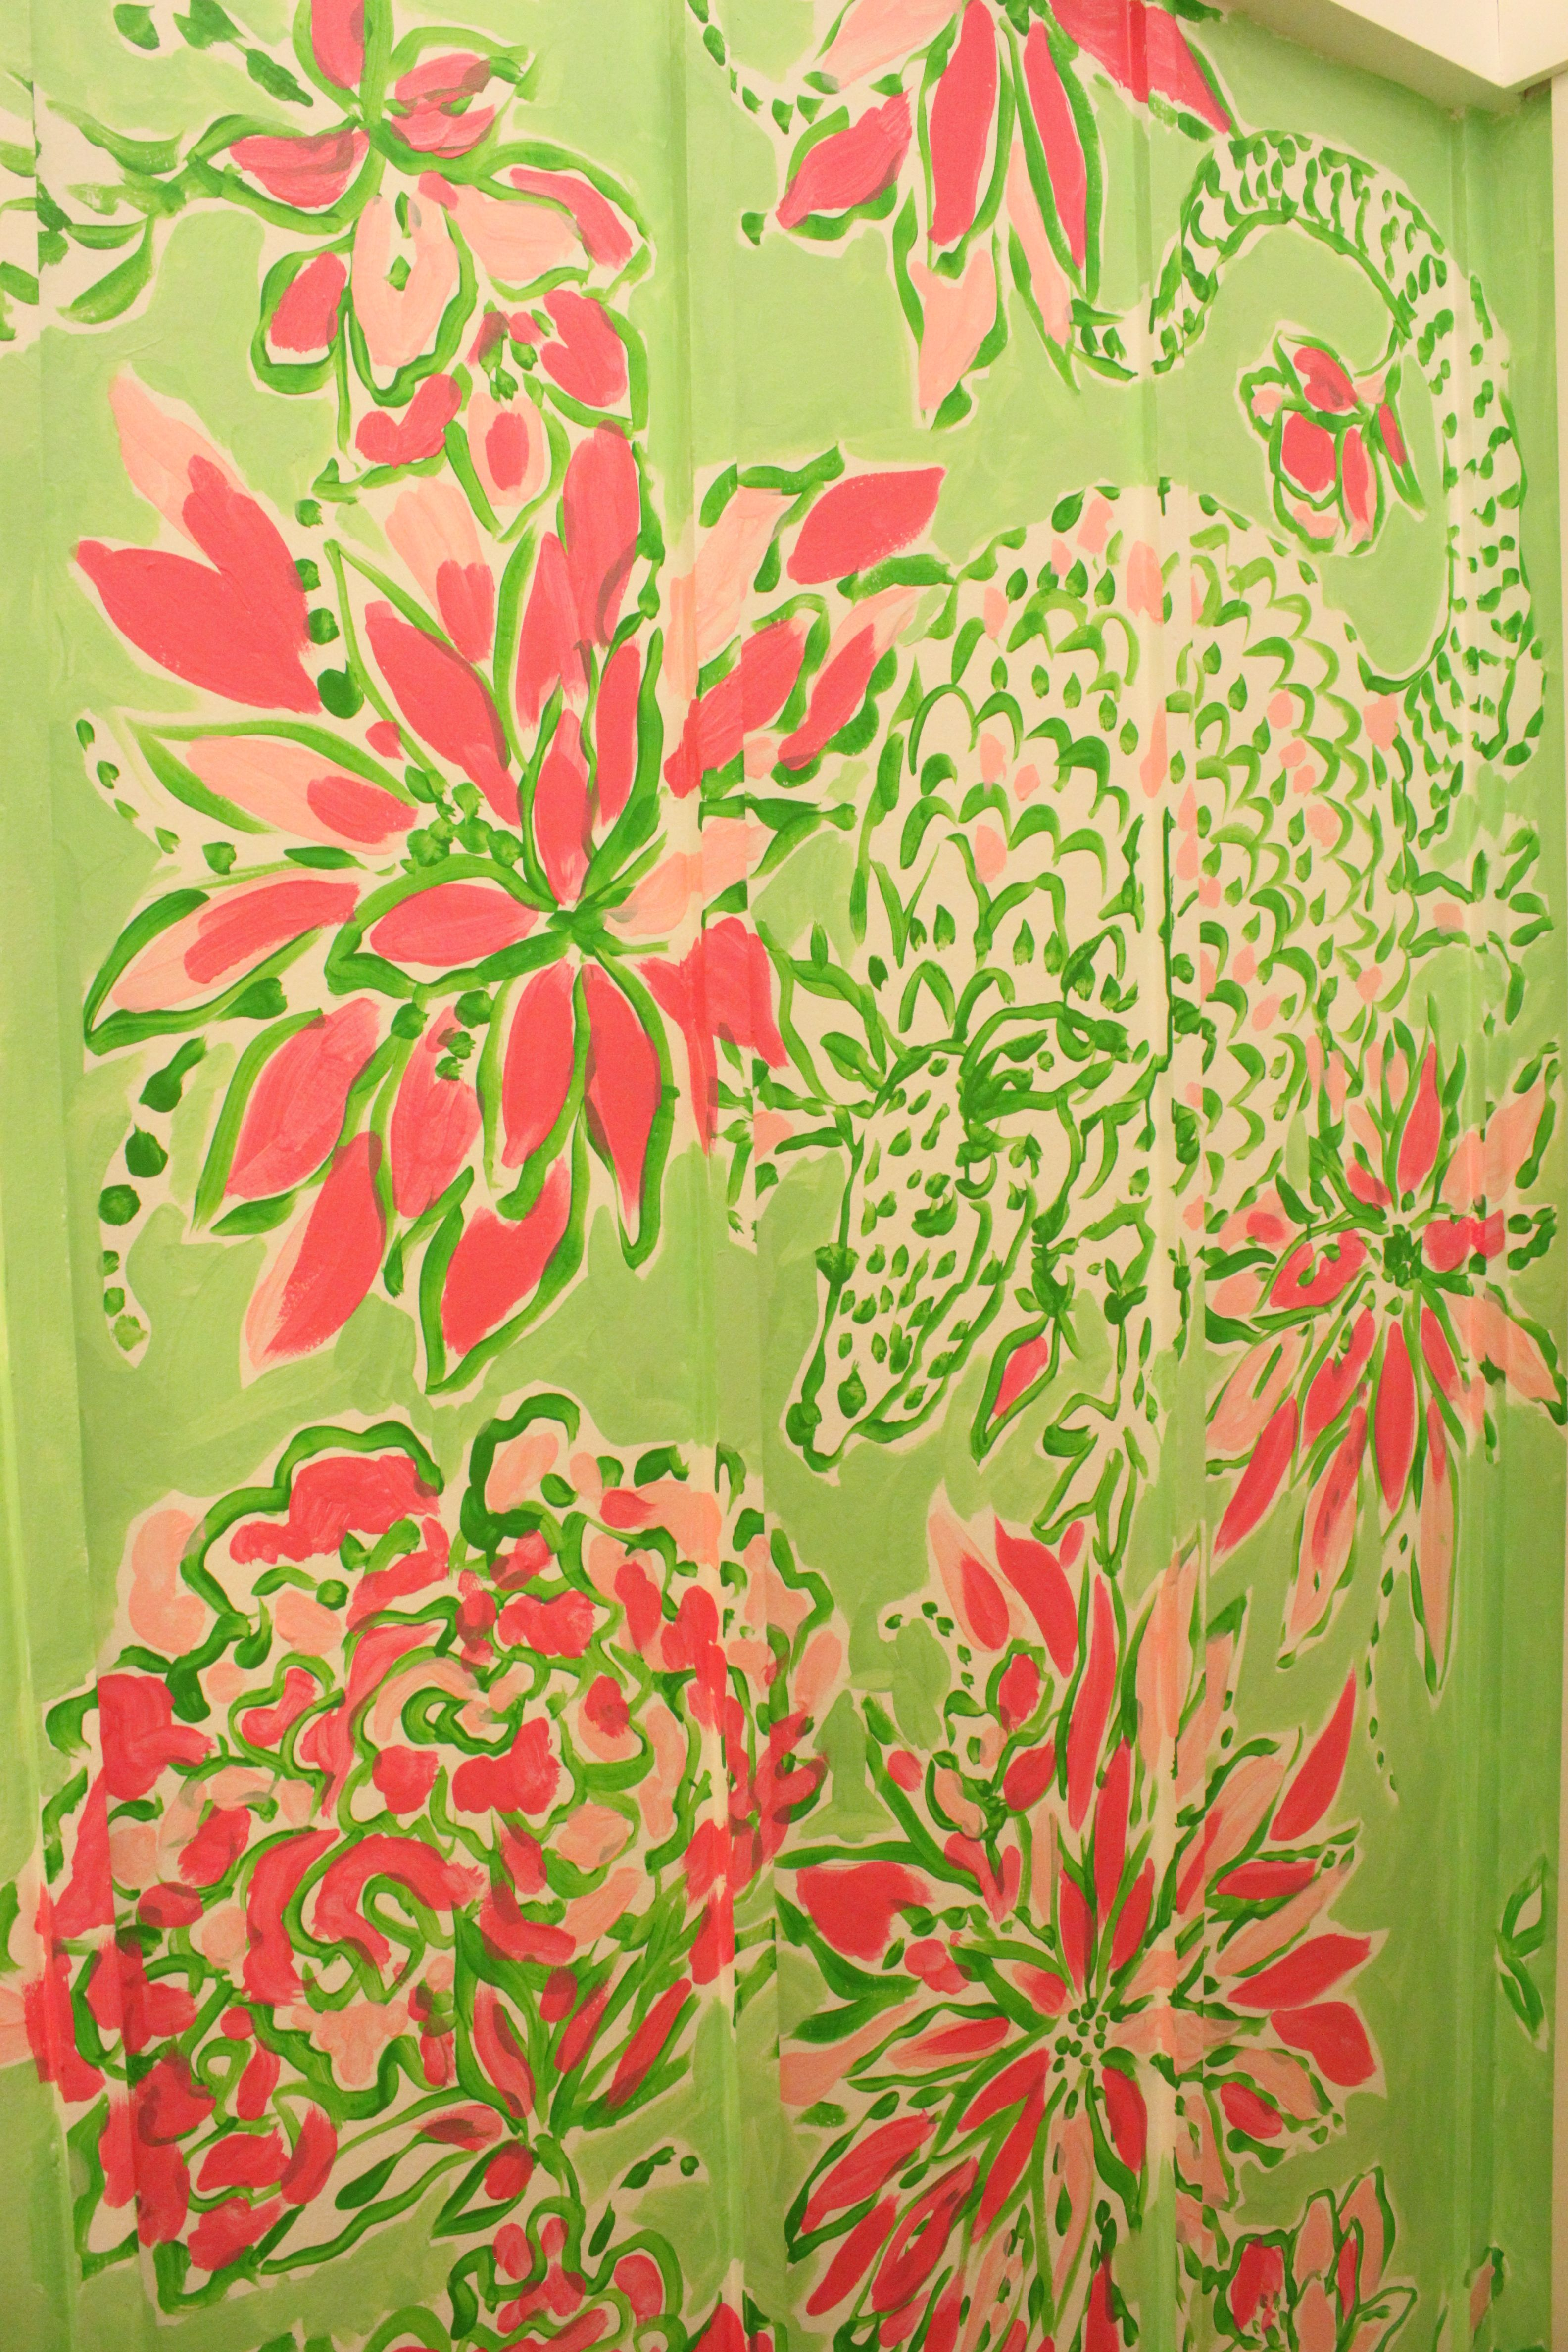 Lilly Pulitzer Retail Store: Southlake, TX Pink & Green Armadillo ...